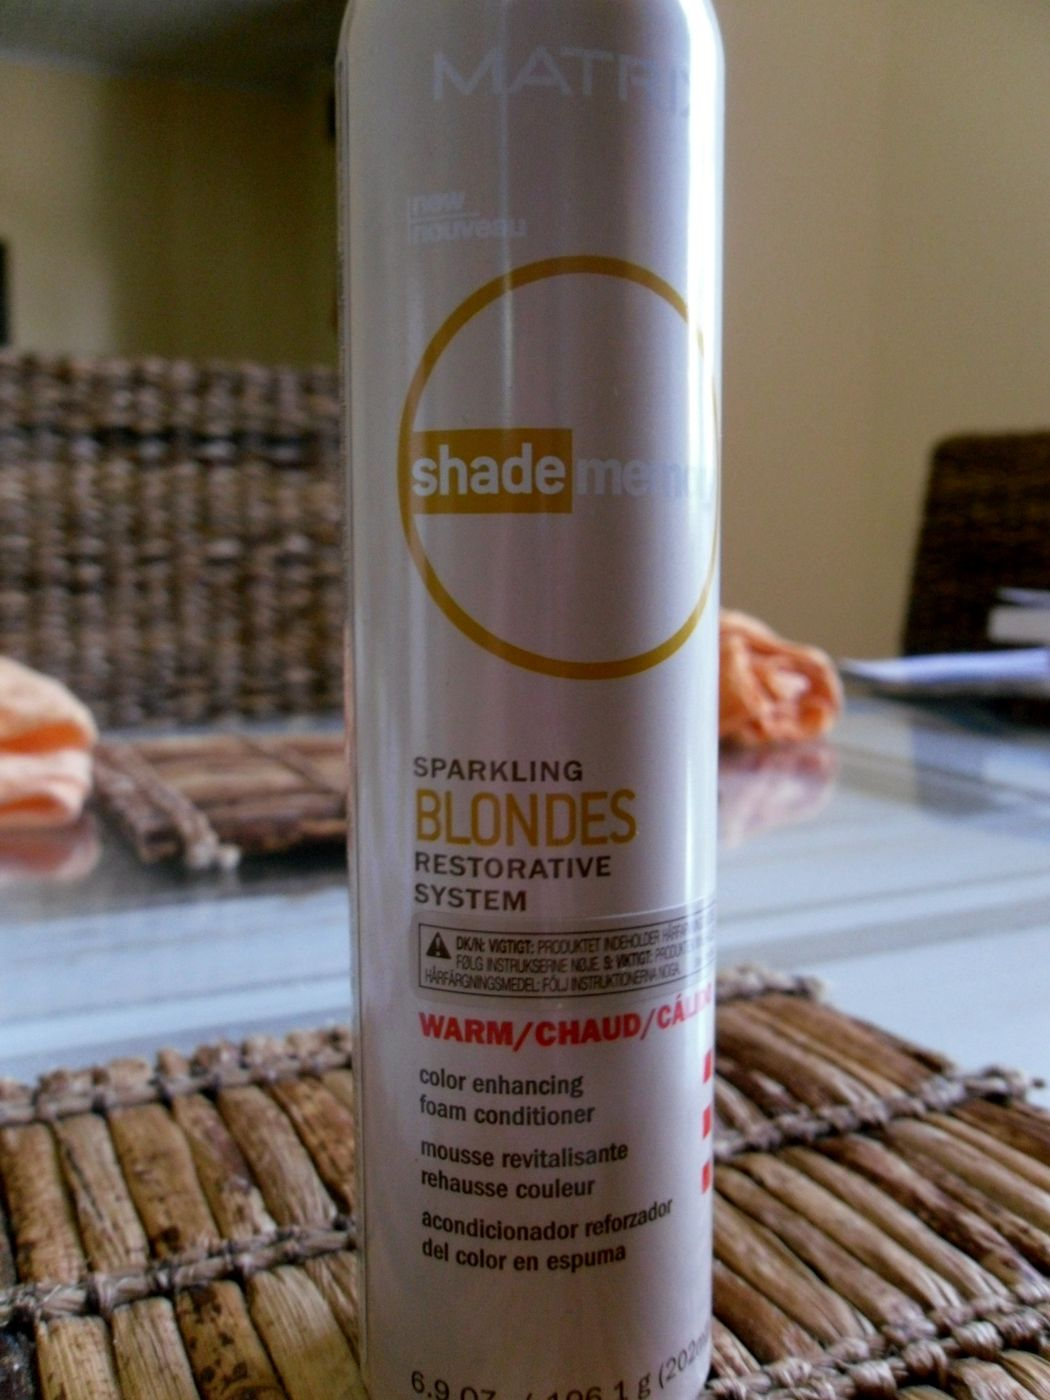 Astetta blondimpi